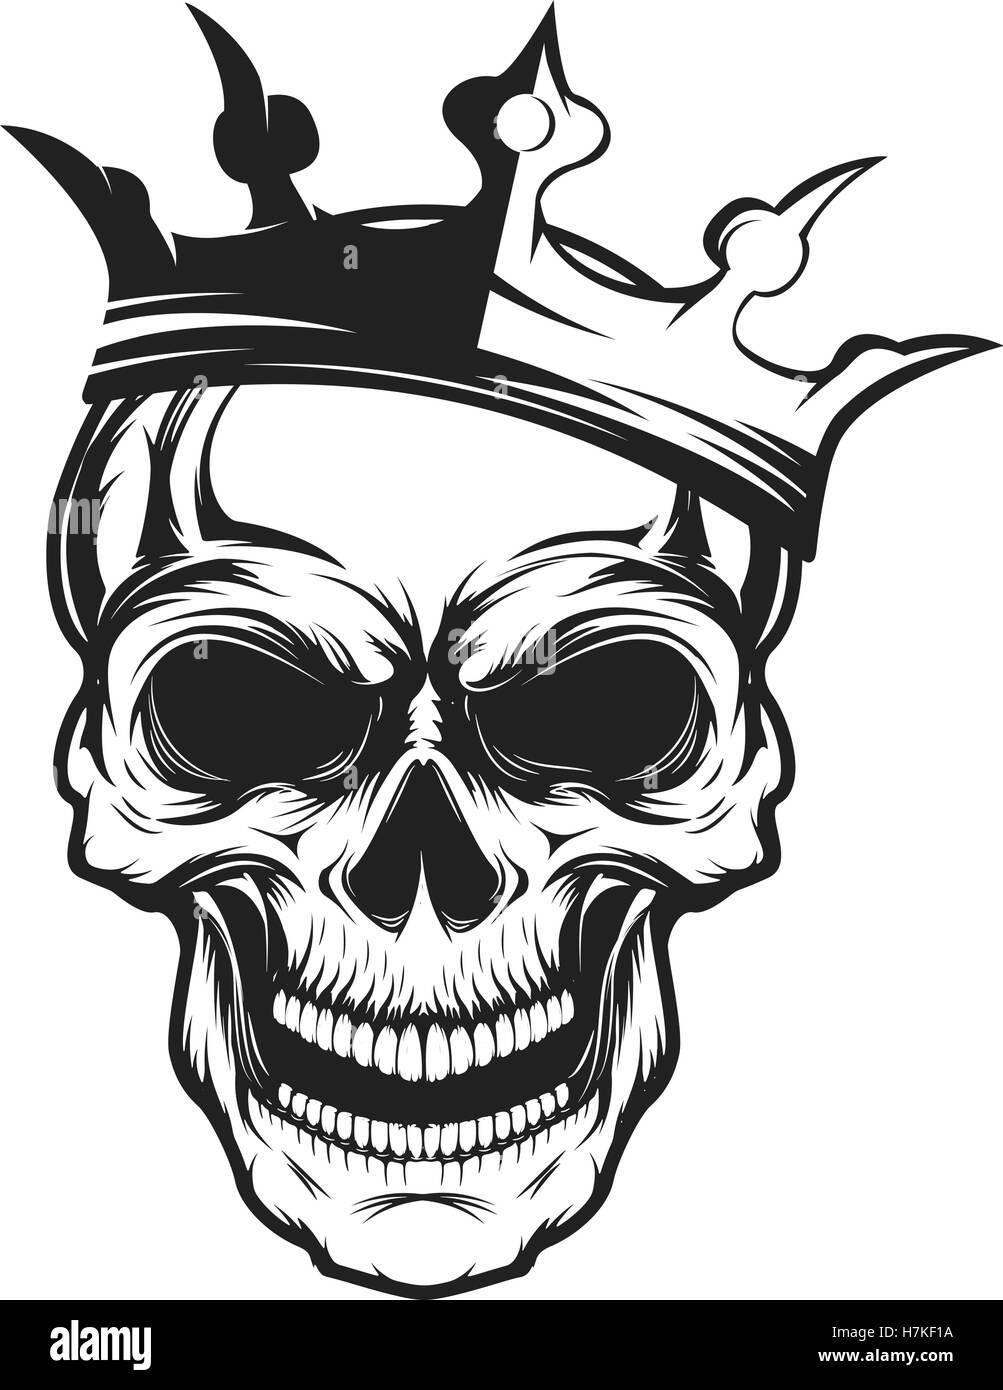 Skull with crown Design element for emblem, badge, sign, t shirt Stock Vector Art